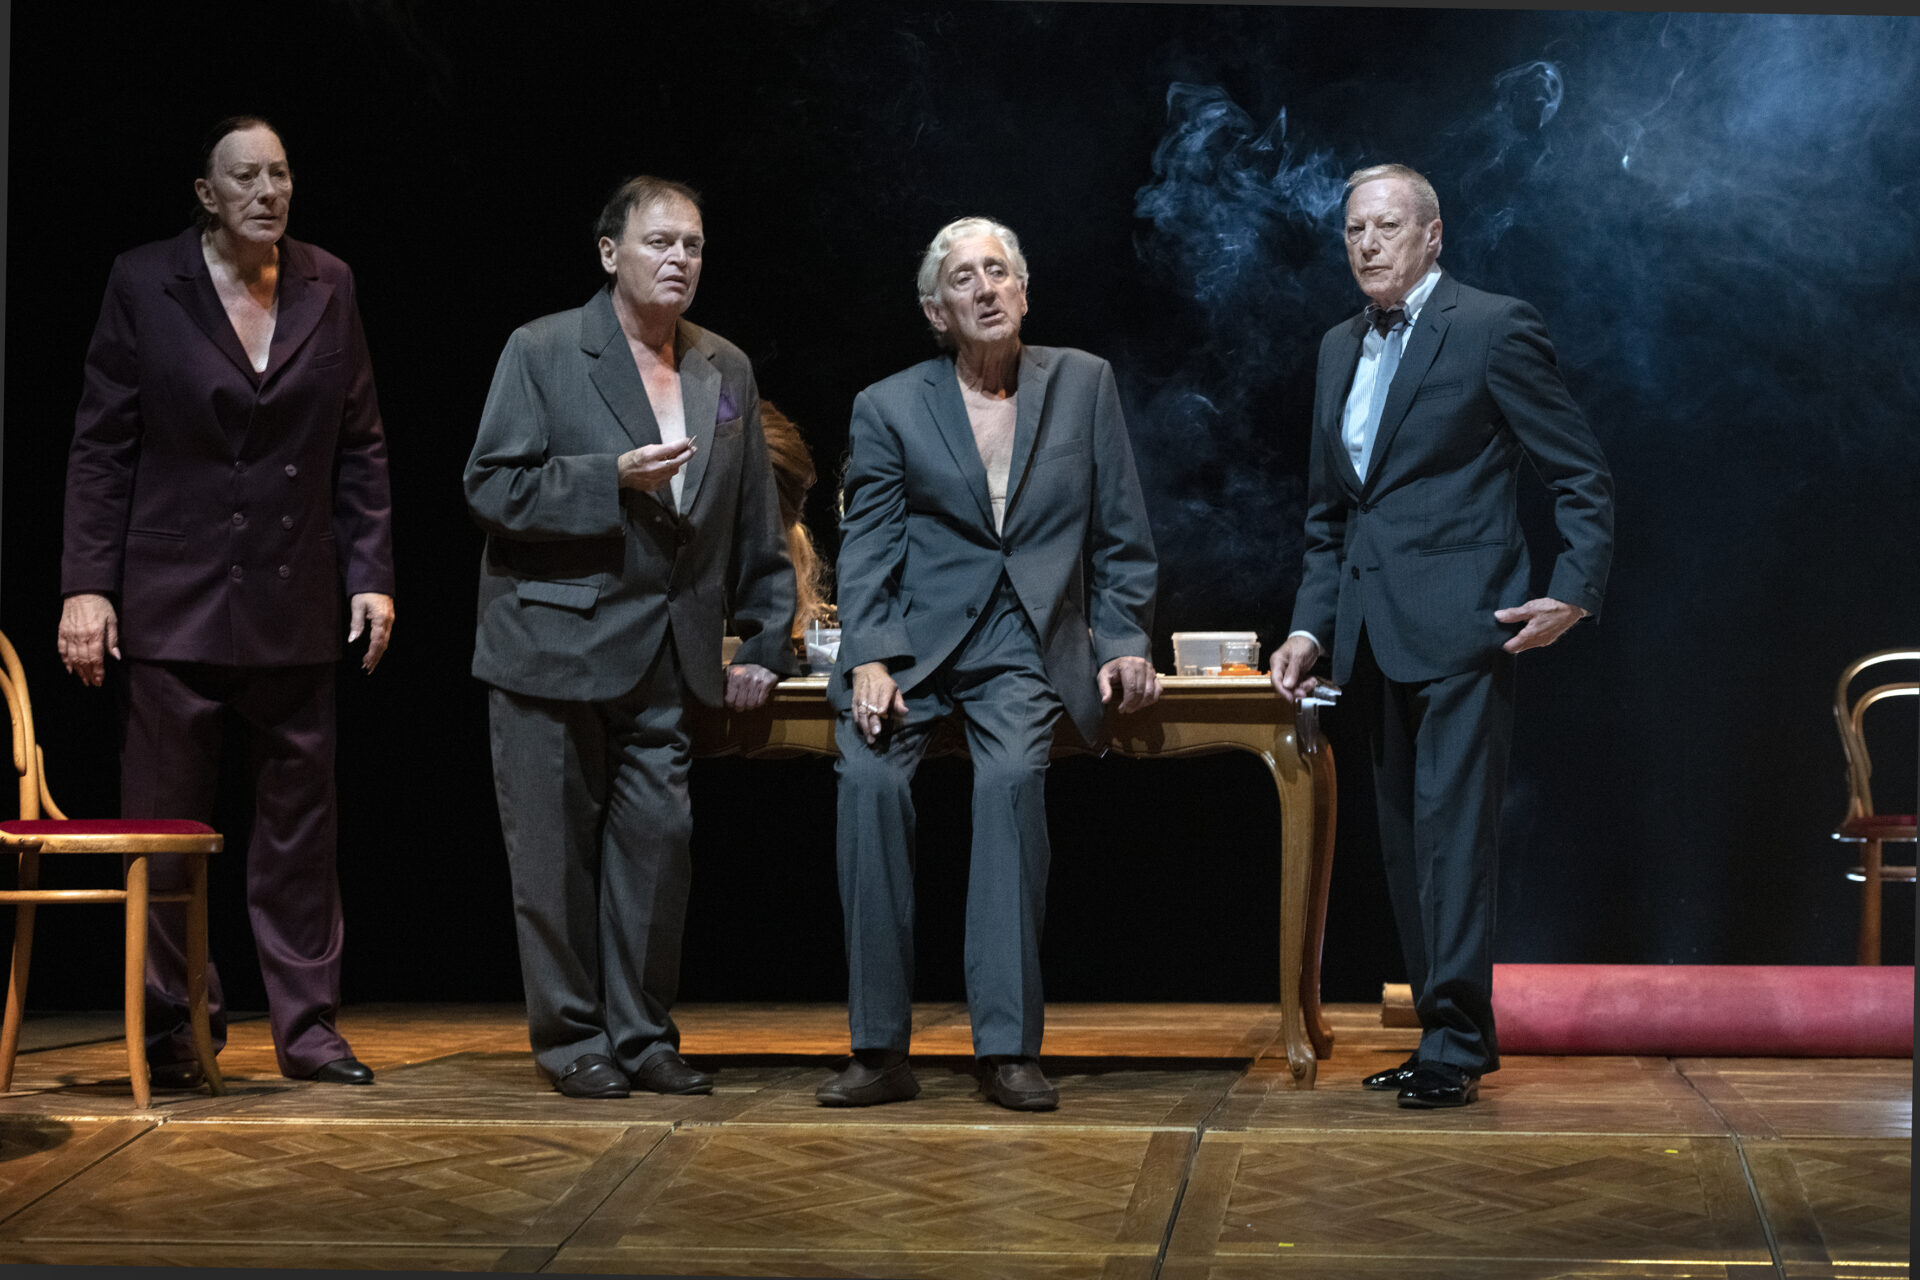 "Frank Van Laecke, Alain Platel, Steven Prengels ""Gardenia – 10 years later"". Fot. Luk Monsaert"